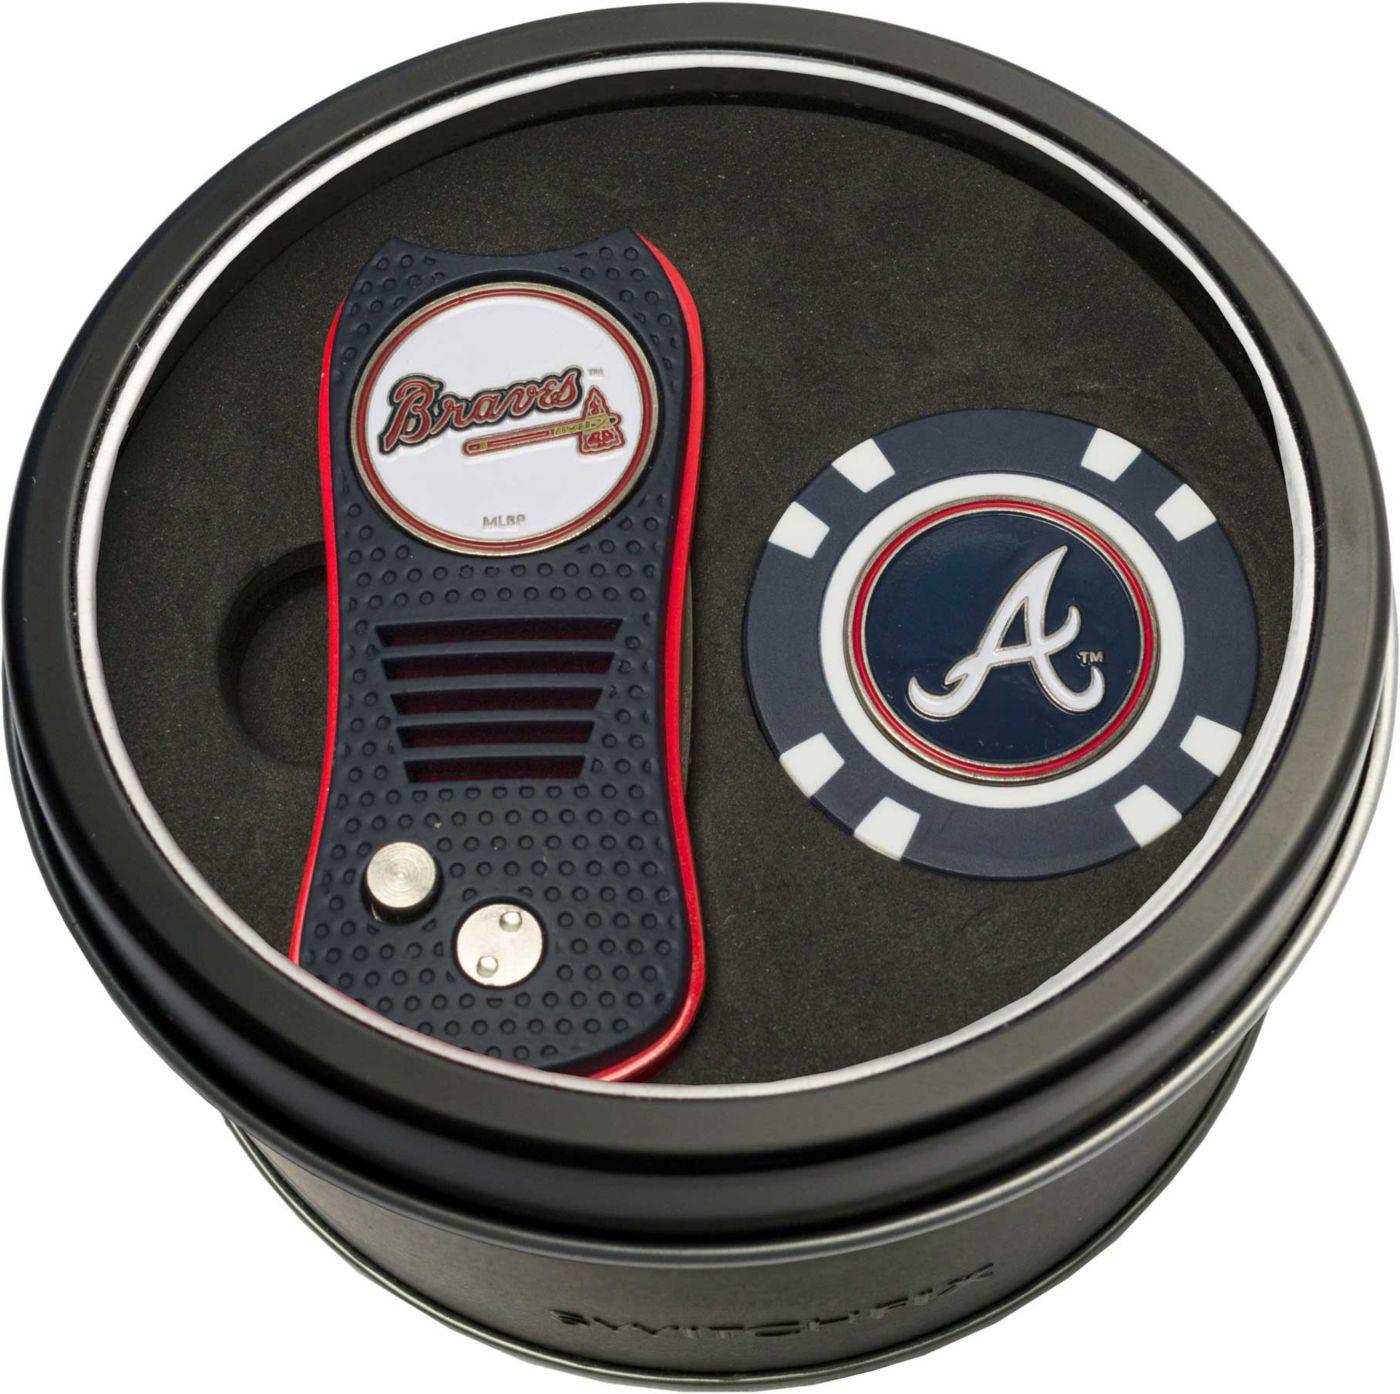 Team Golf Atlanta Braves Switchfix Divot Tool and Poker Chip Ball Marker Set